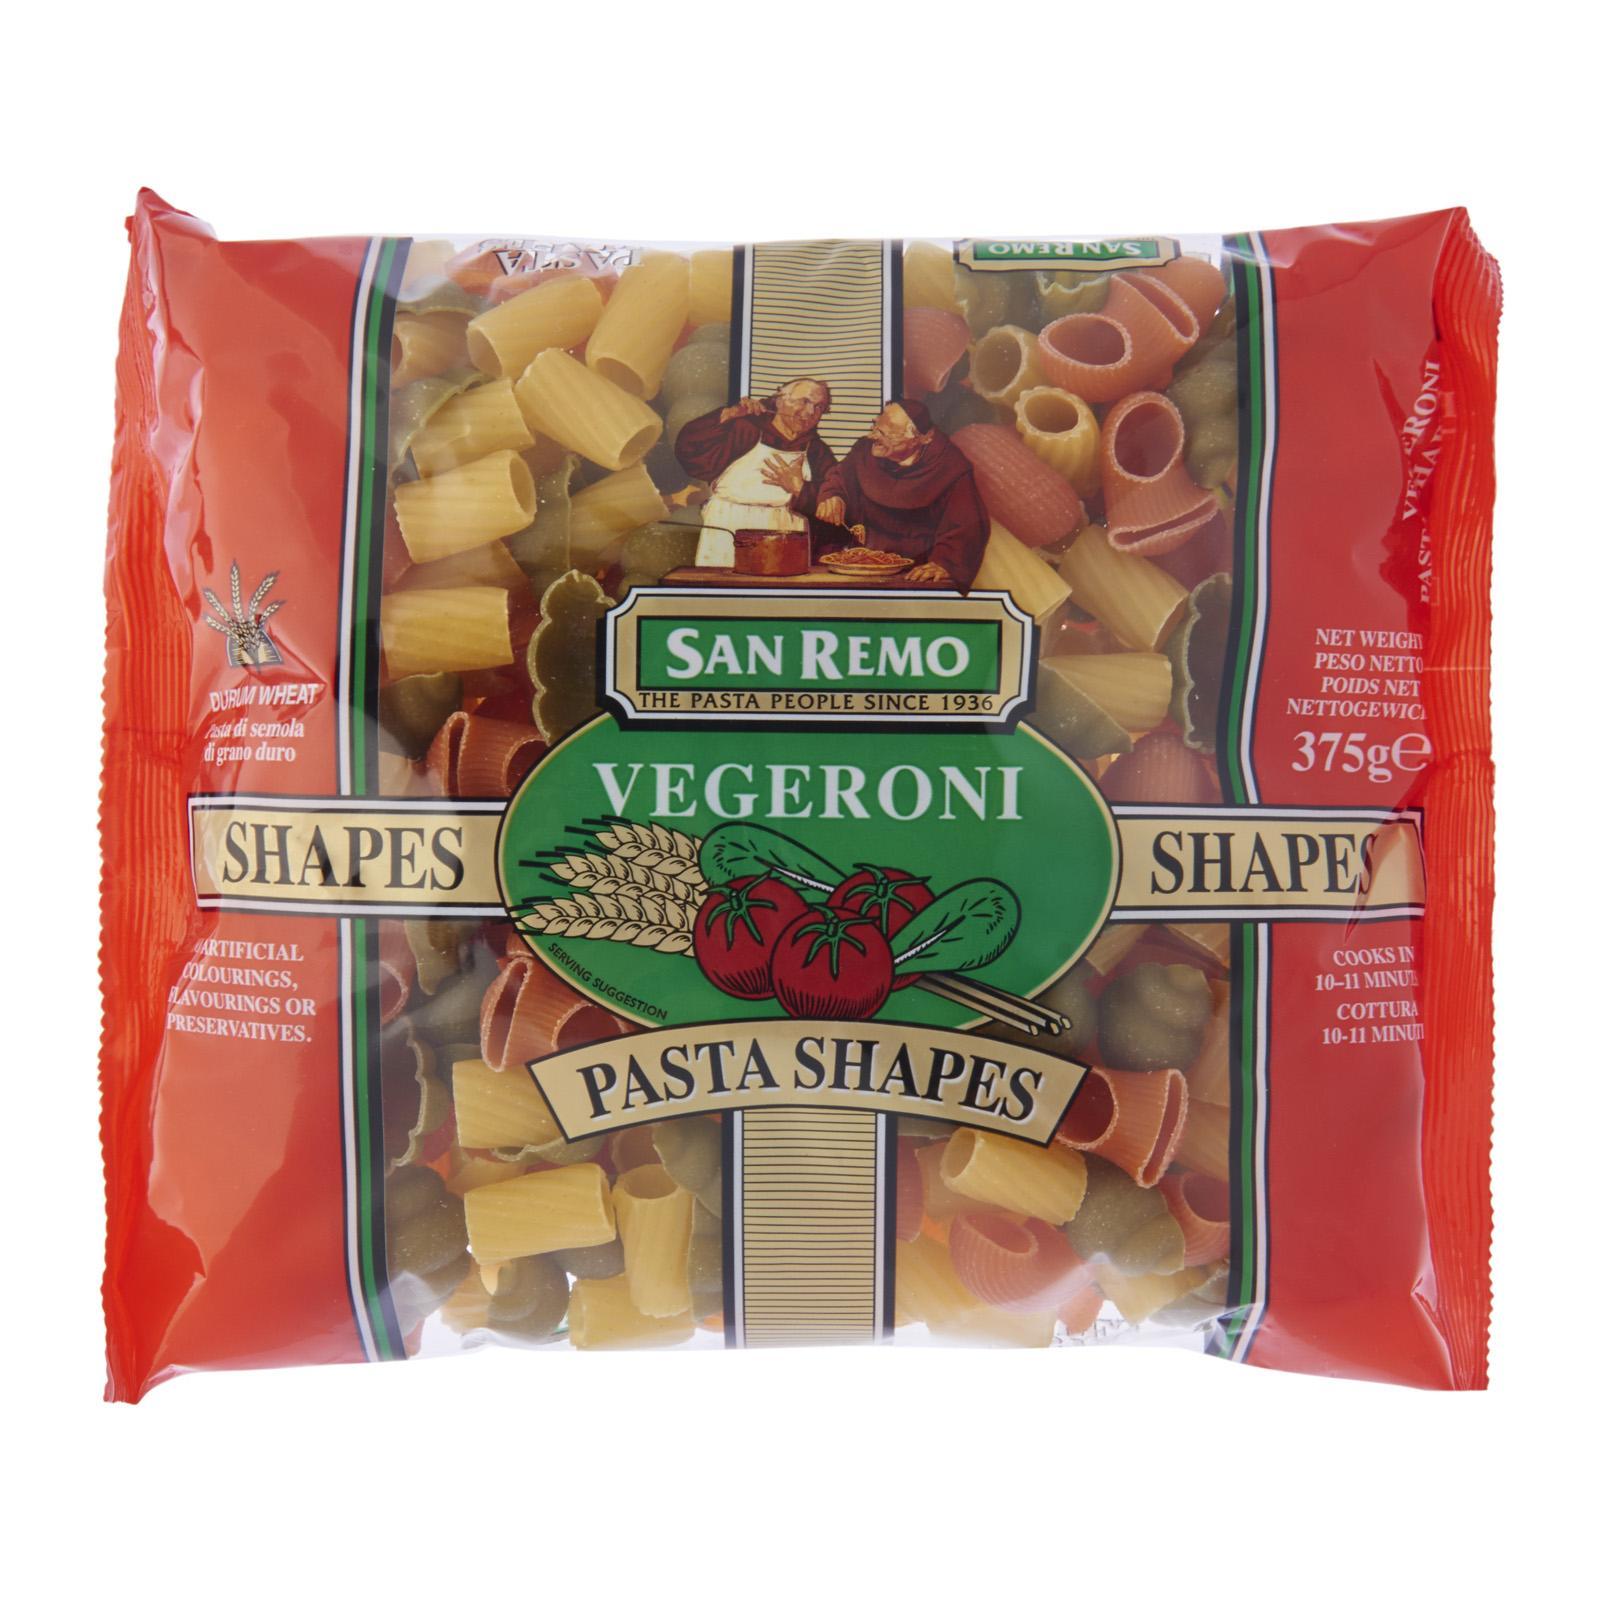 San Remo Pasta Vegeroni Shapes No. 120